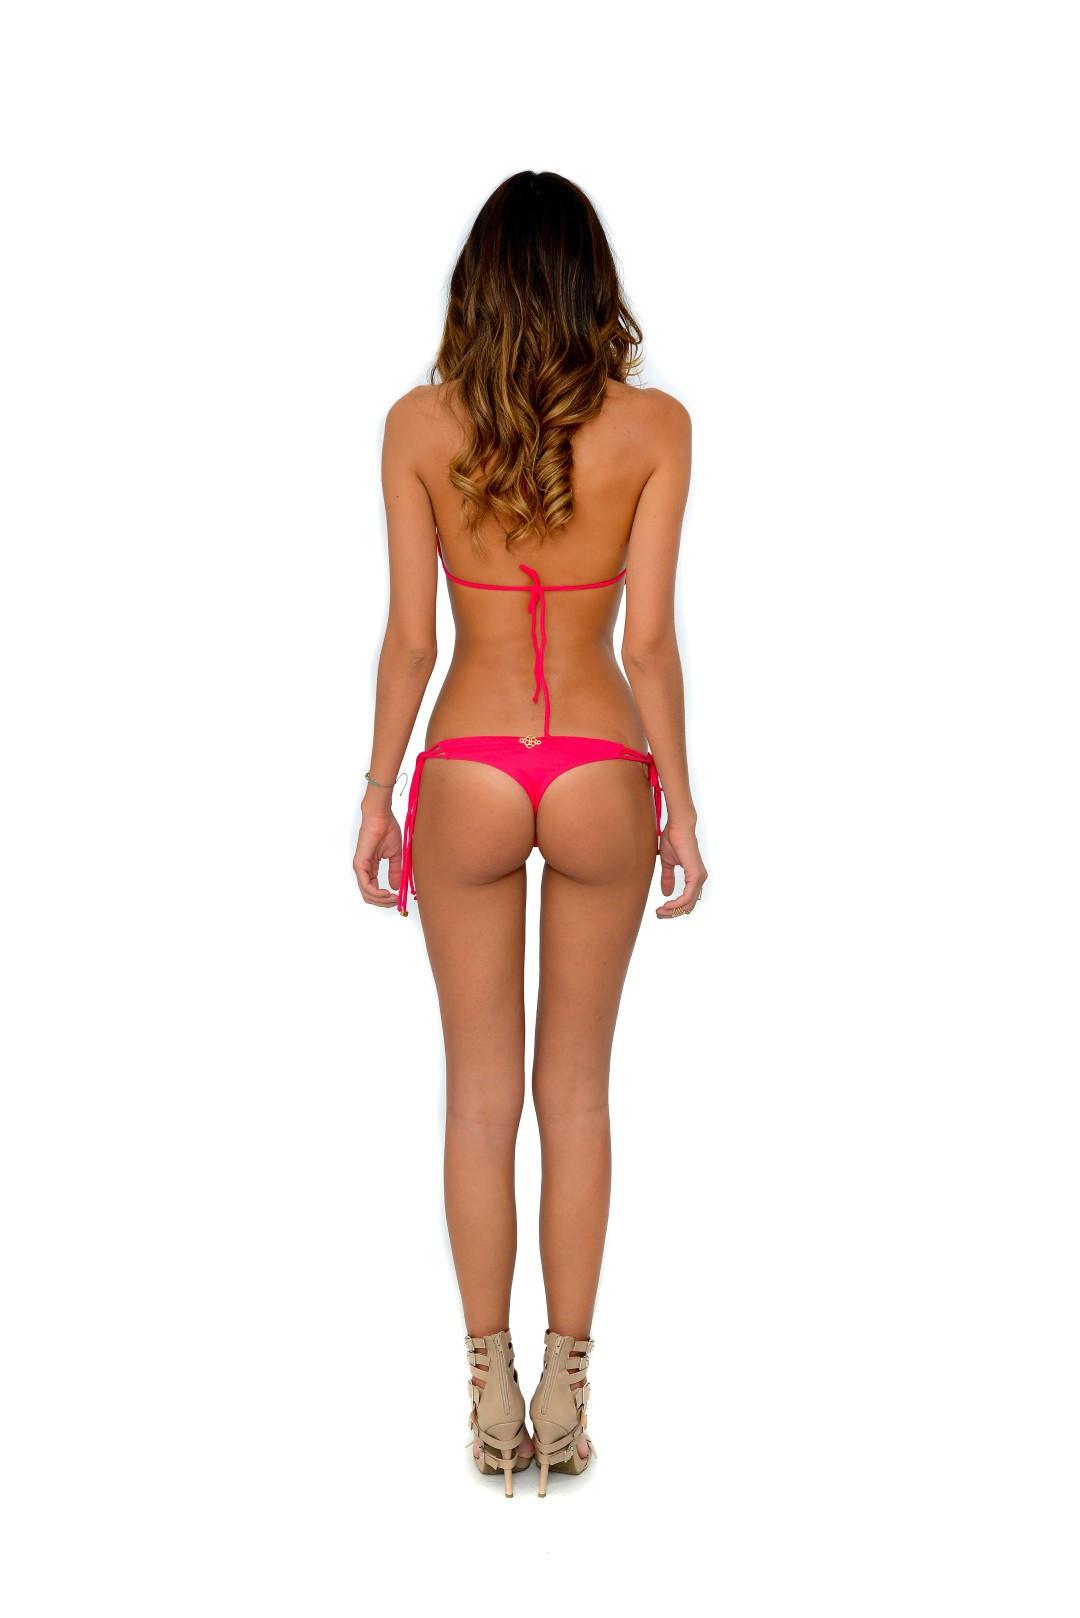 del mar aurora strings triangle bikini top in sherbet in red lyst